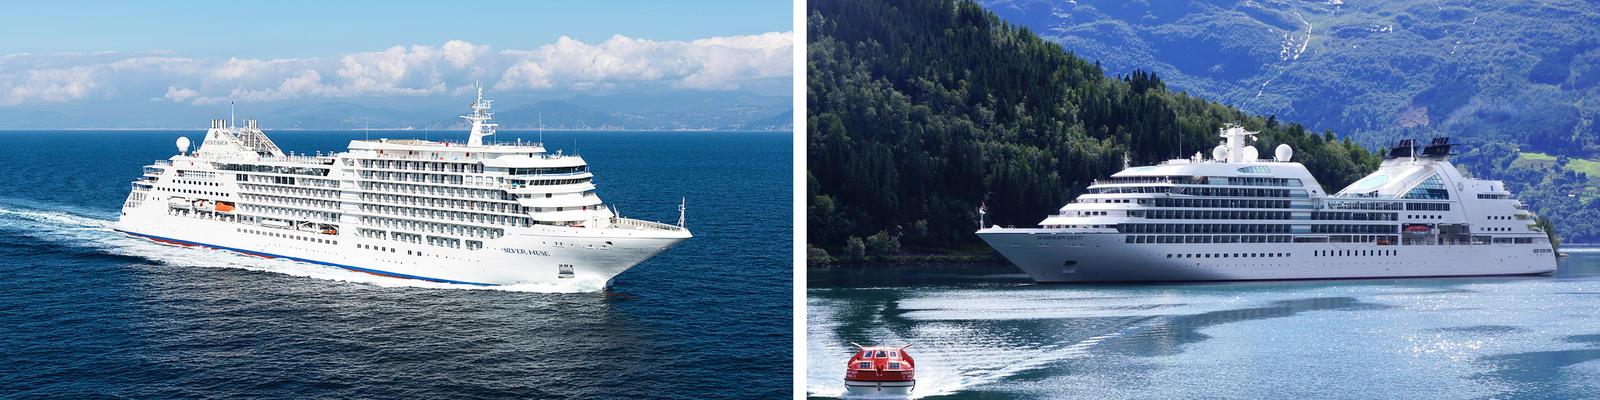 Silversea vs. Seabourn Cruise Line (Photo: Silversea & Seabourn)